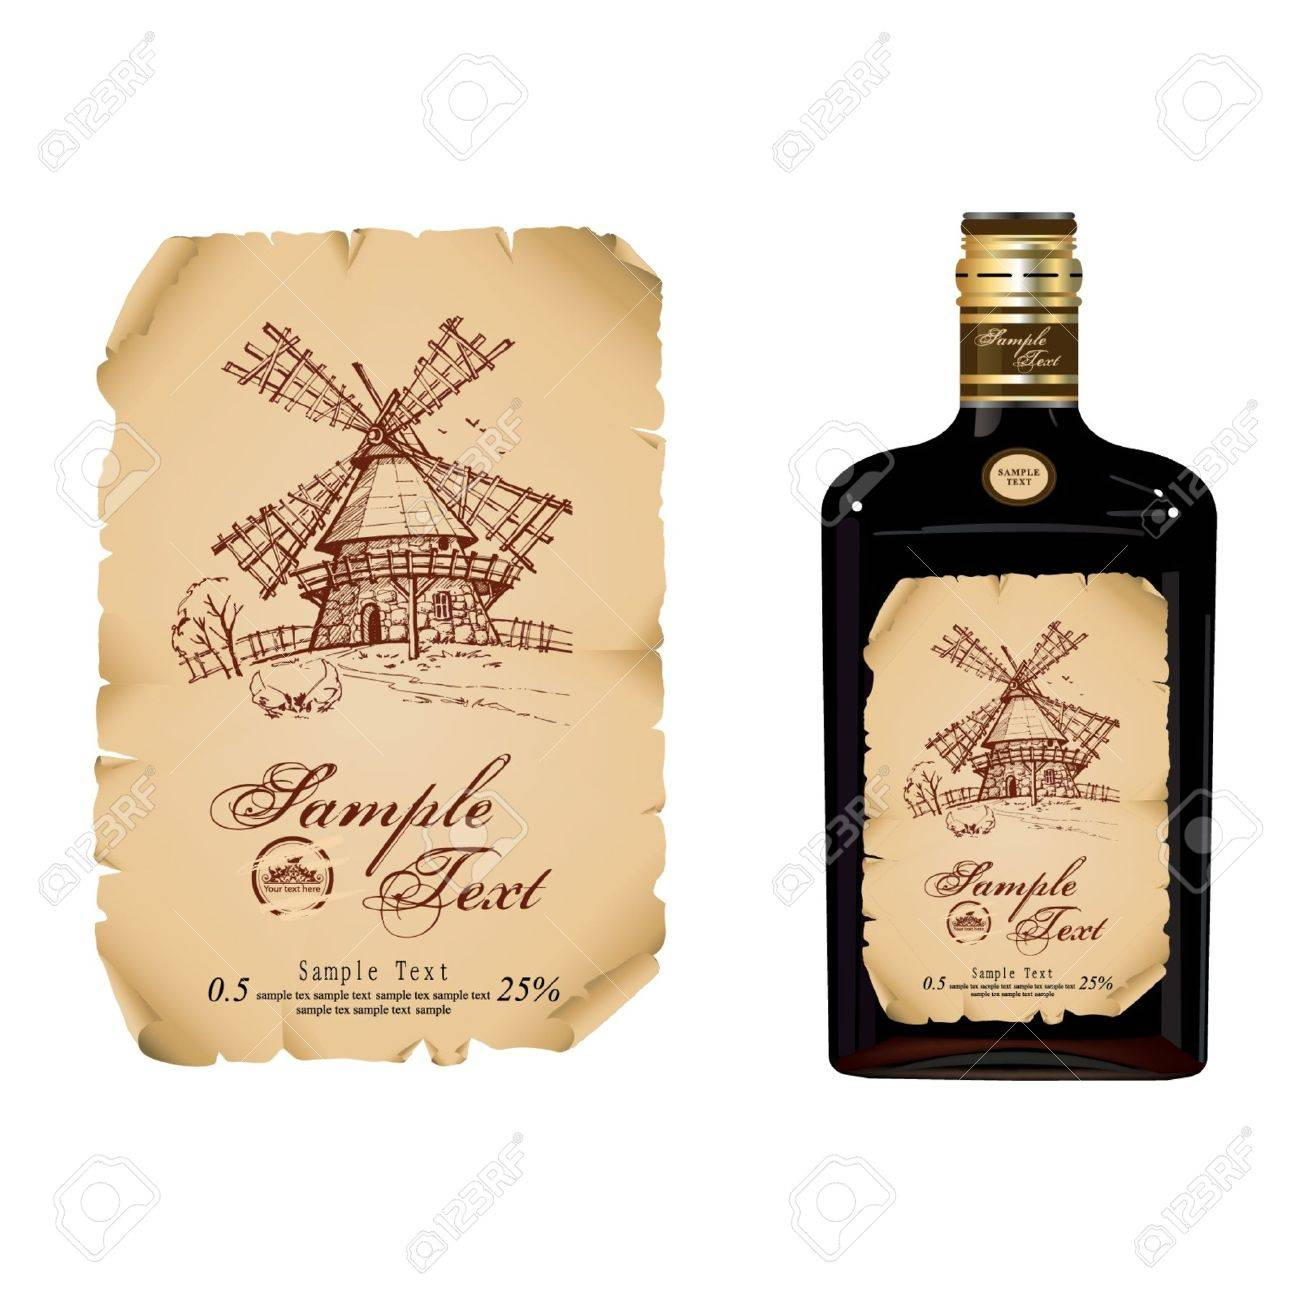 wine bottle label  realistic illustration Stock Vector - 16833491